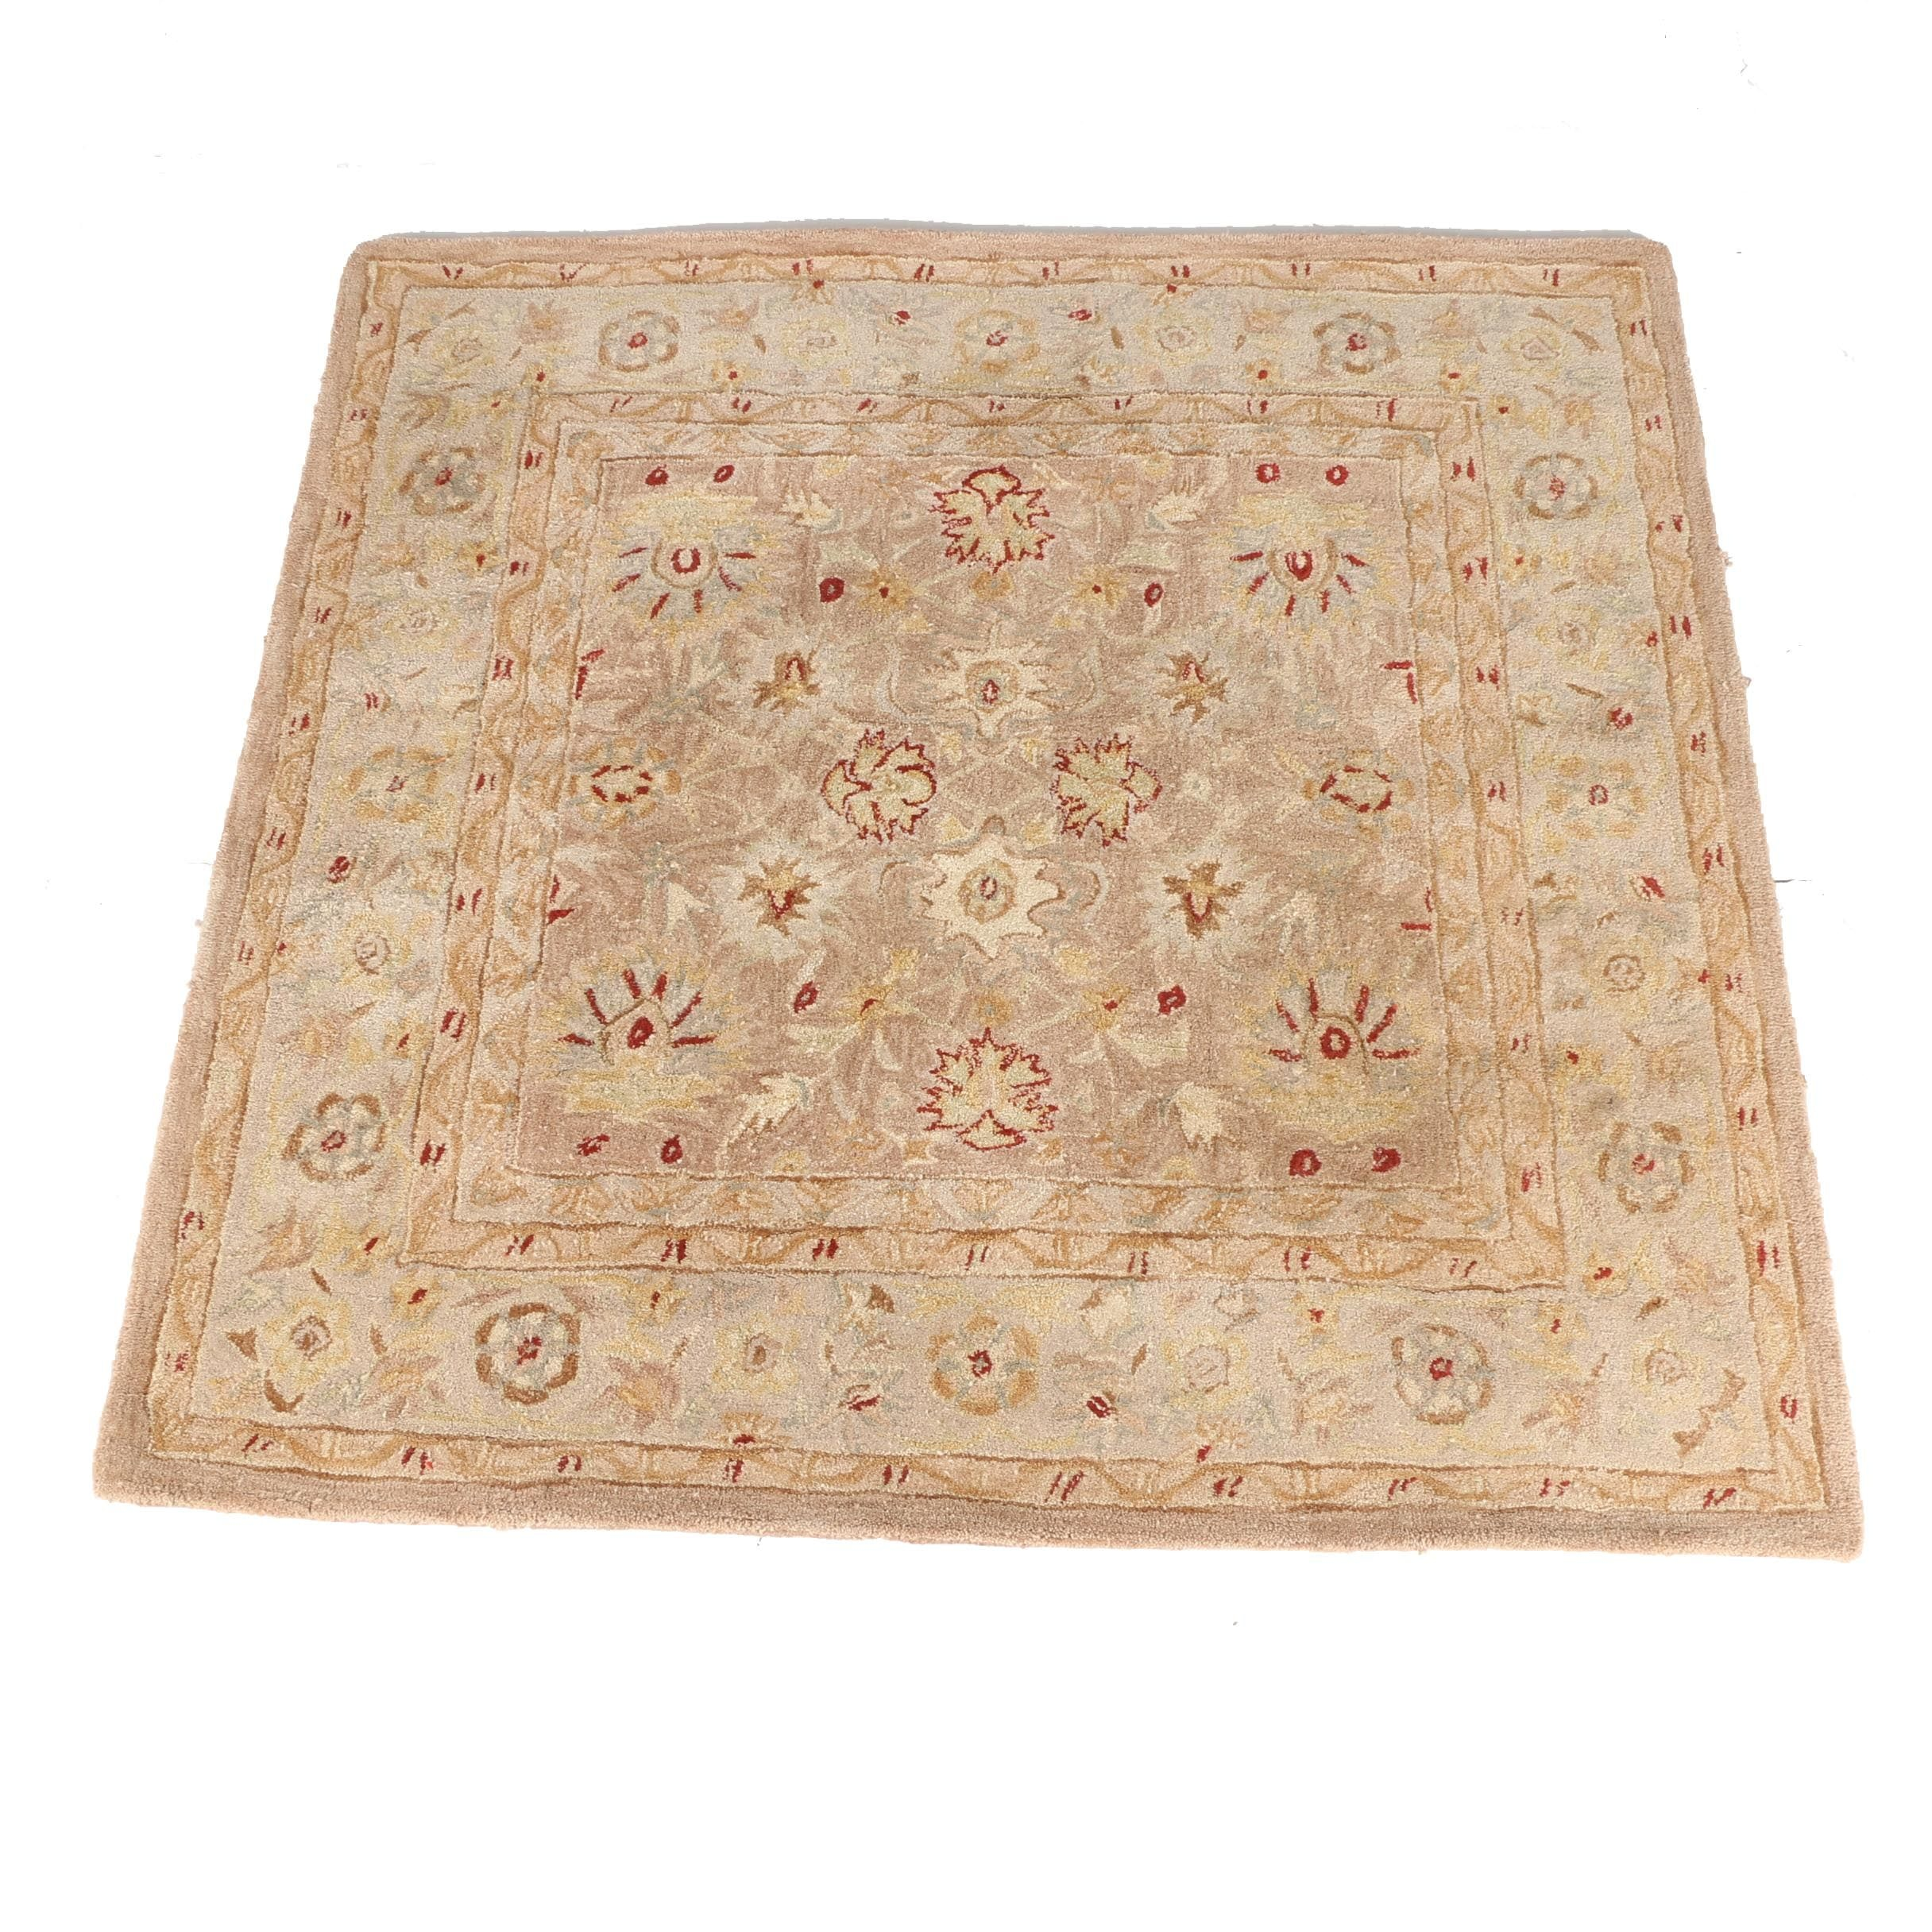 "Hand-Tufted Safavieh ""Anatolia"" Wool Area Rug"